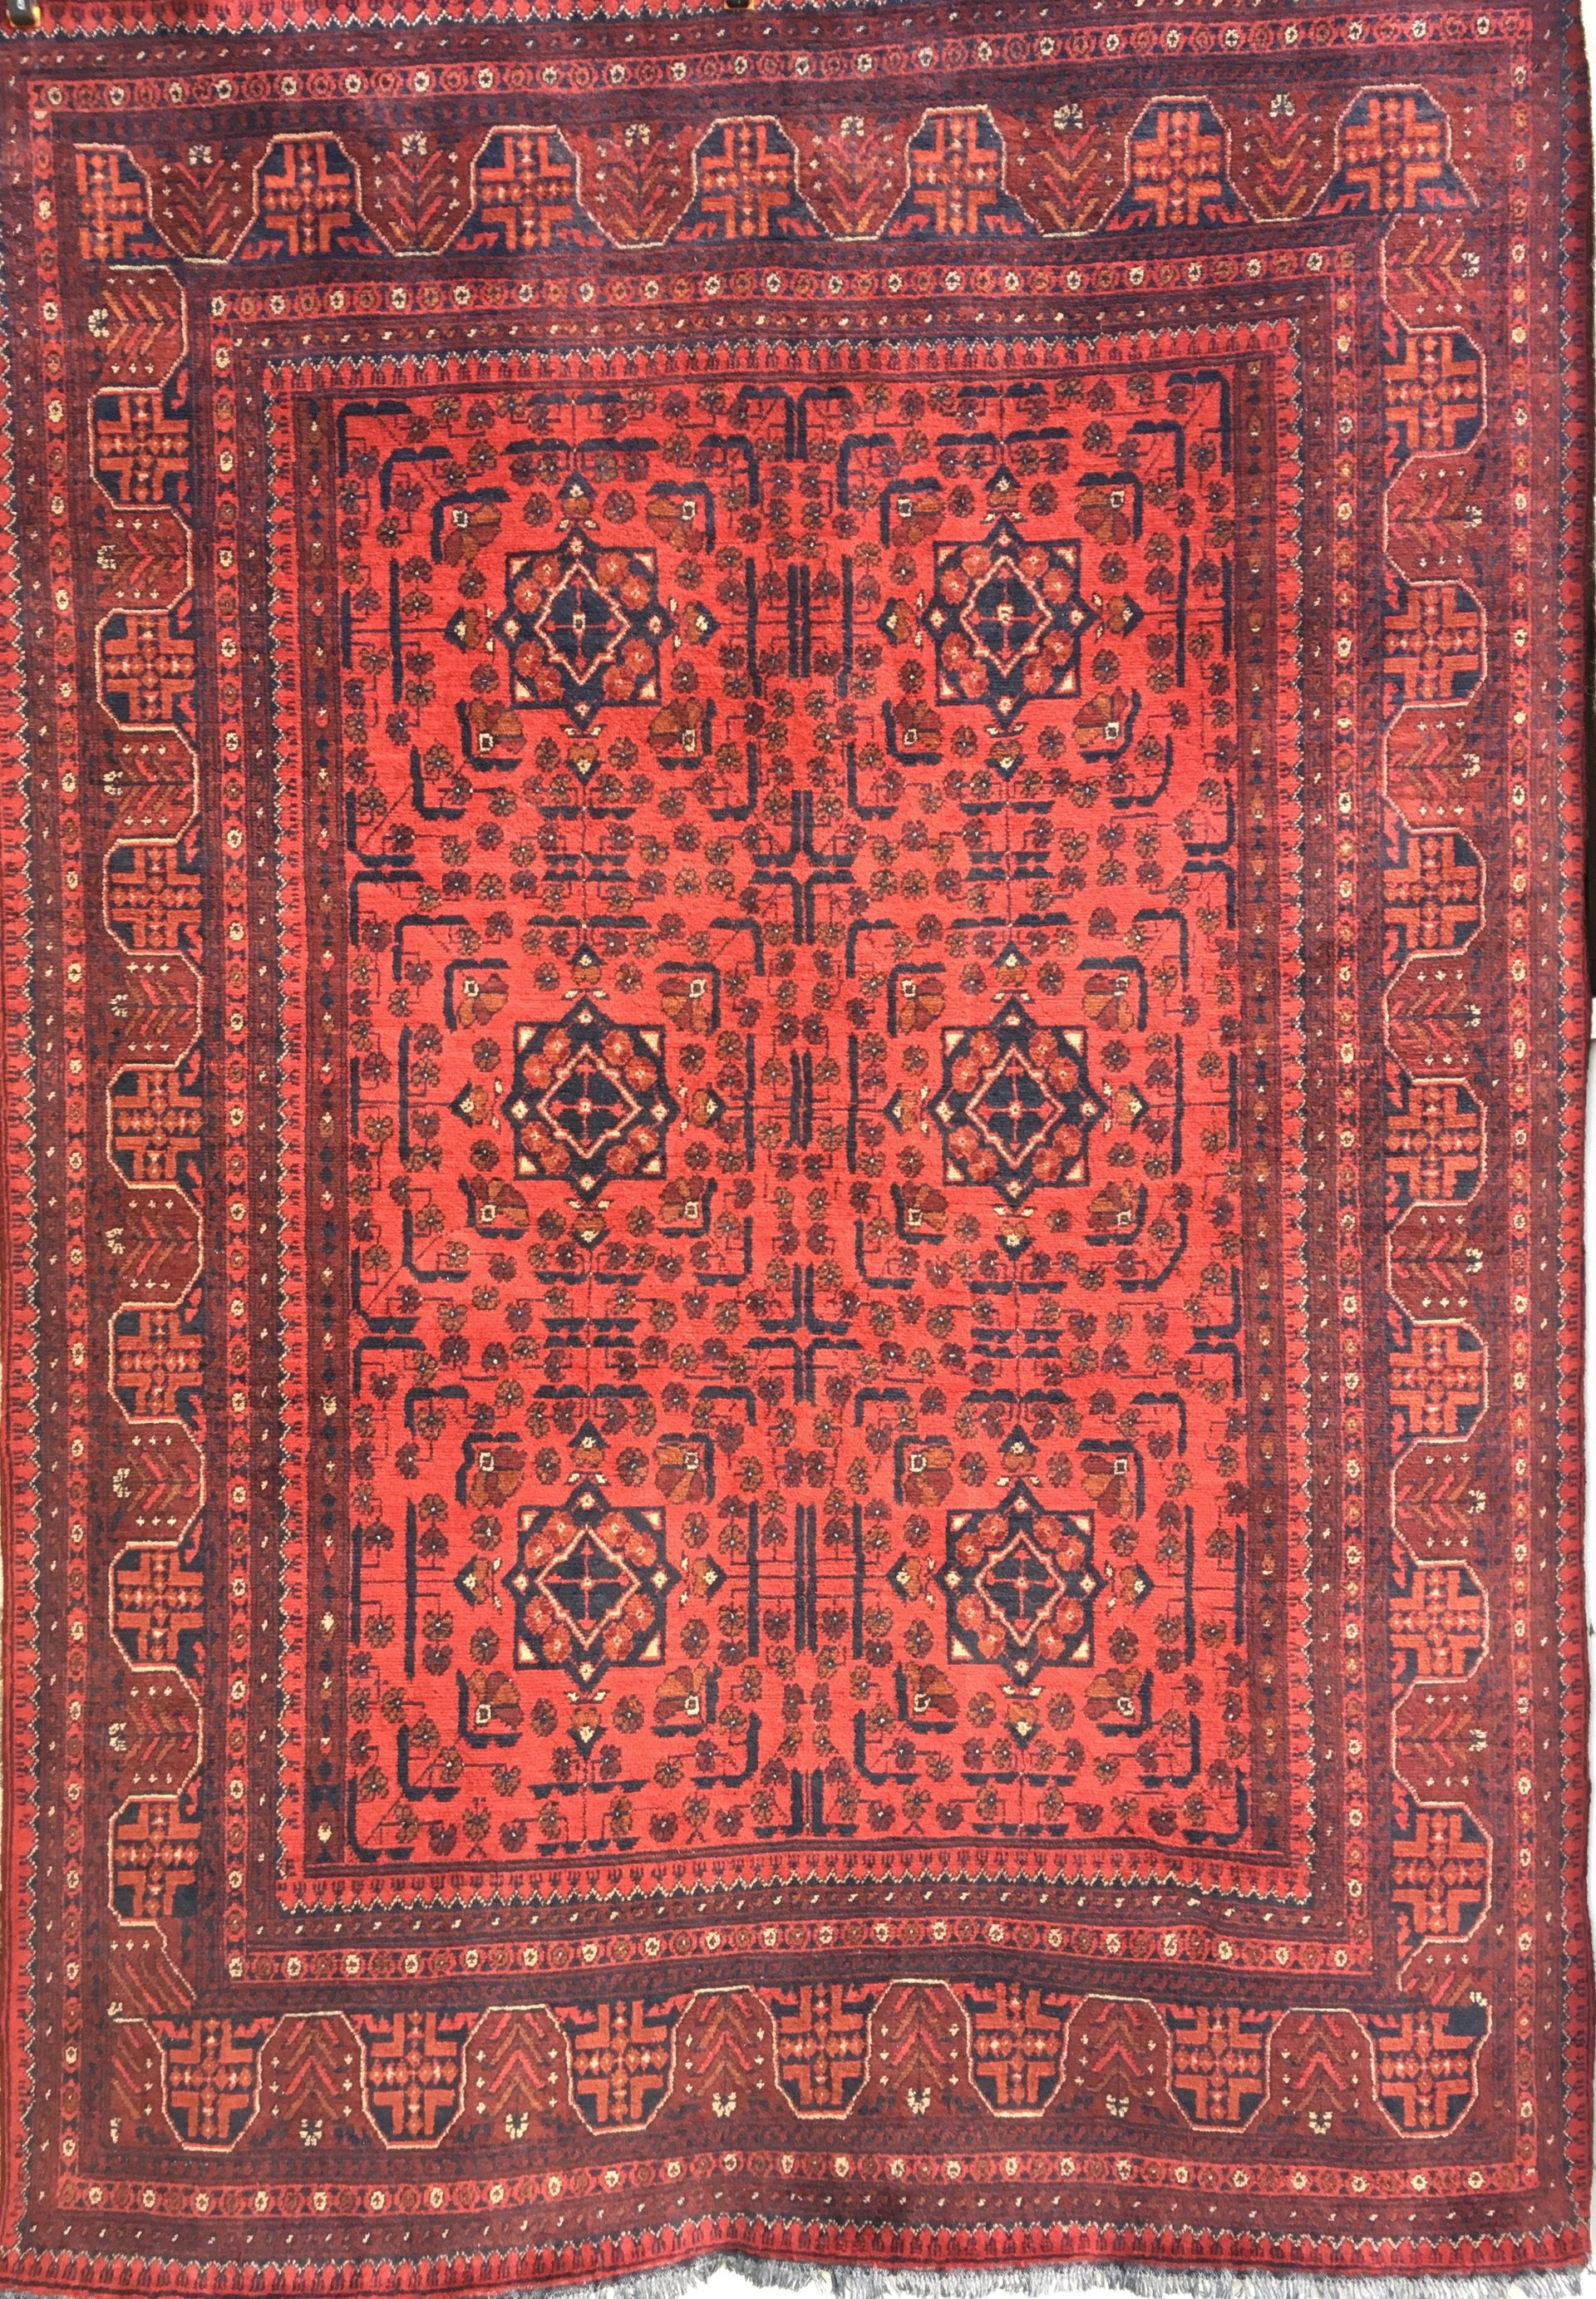 Classic handmade rug